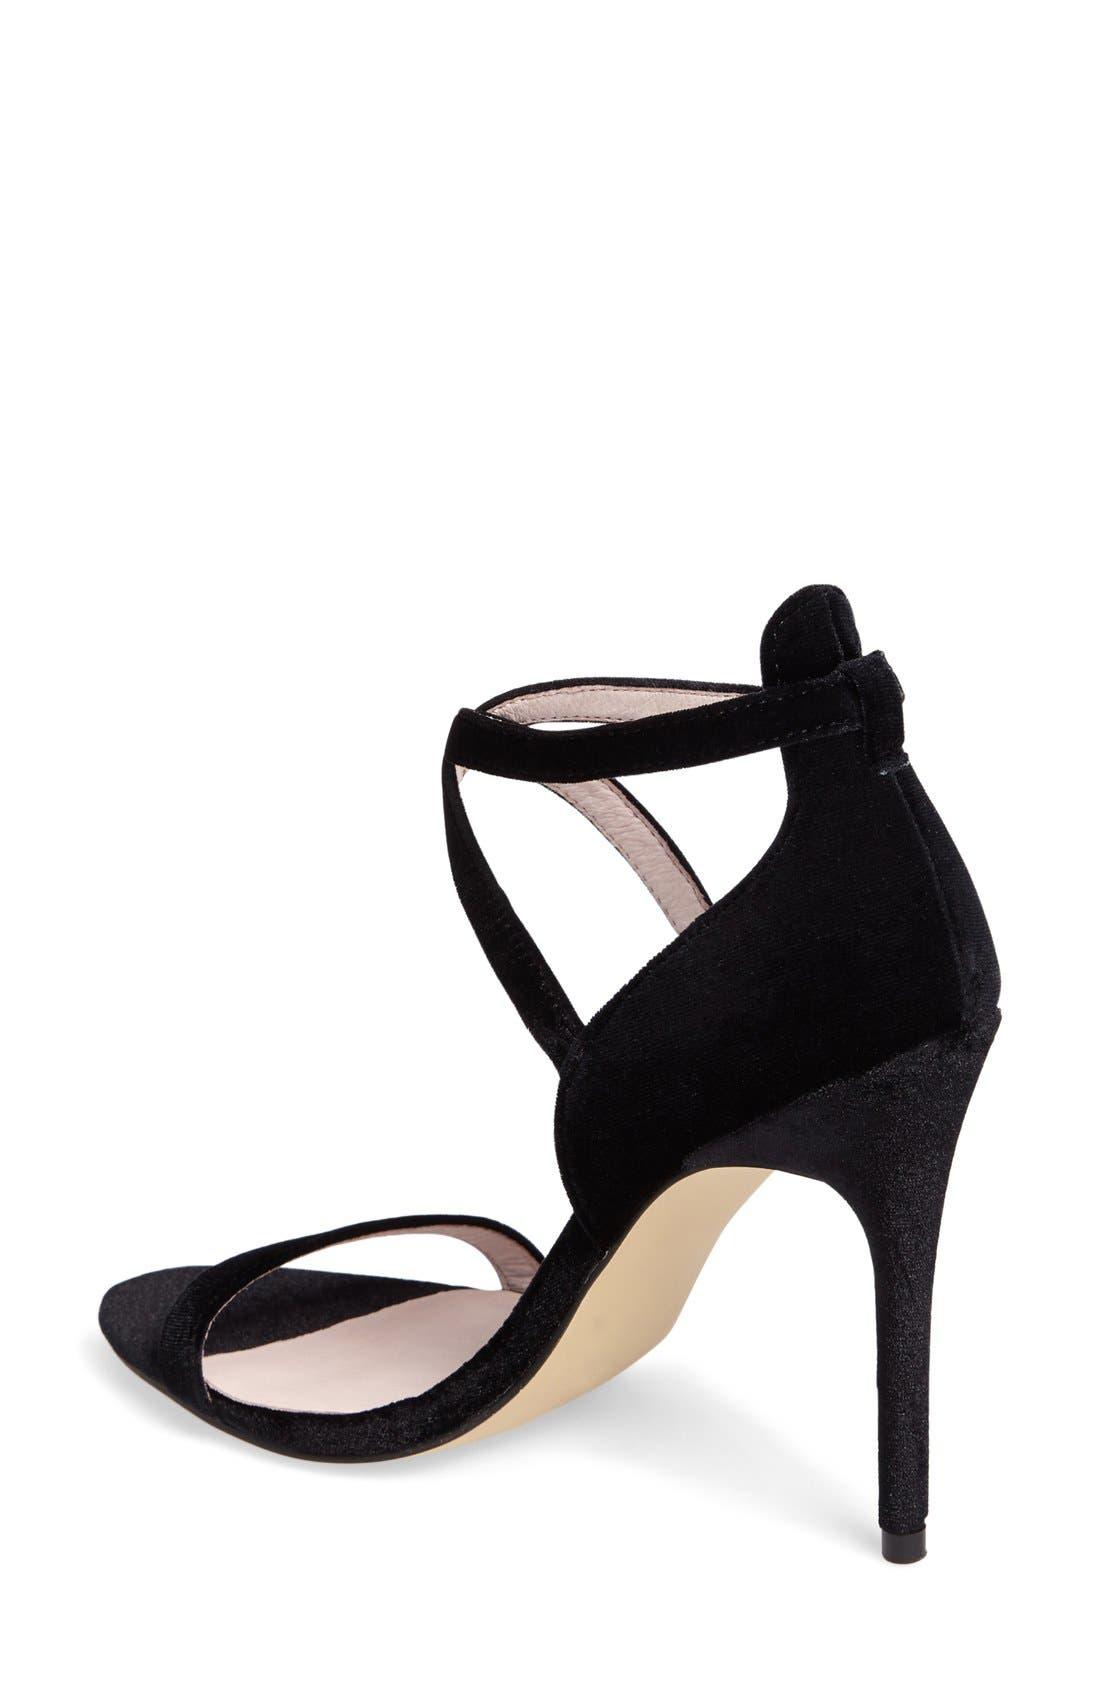 Lavelle Ankle Strap Sandal,                             Alternate thumbnail 6, color,                             001